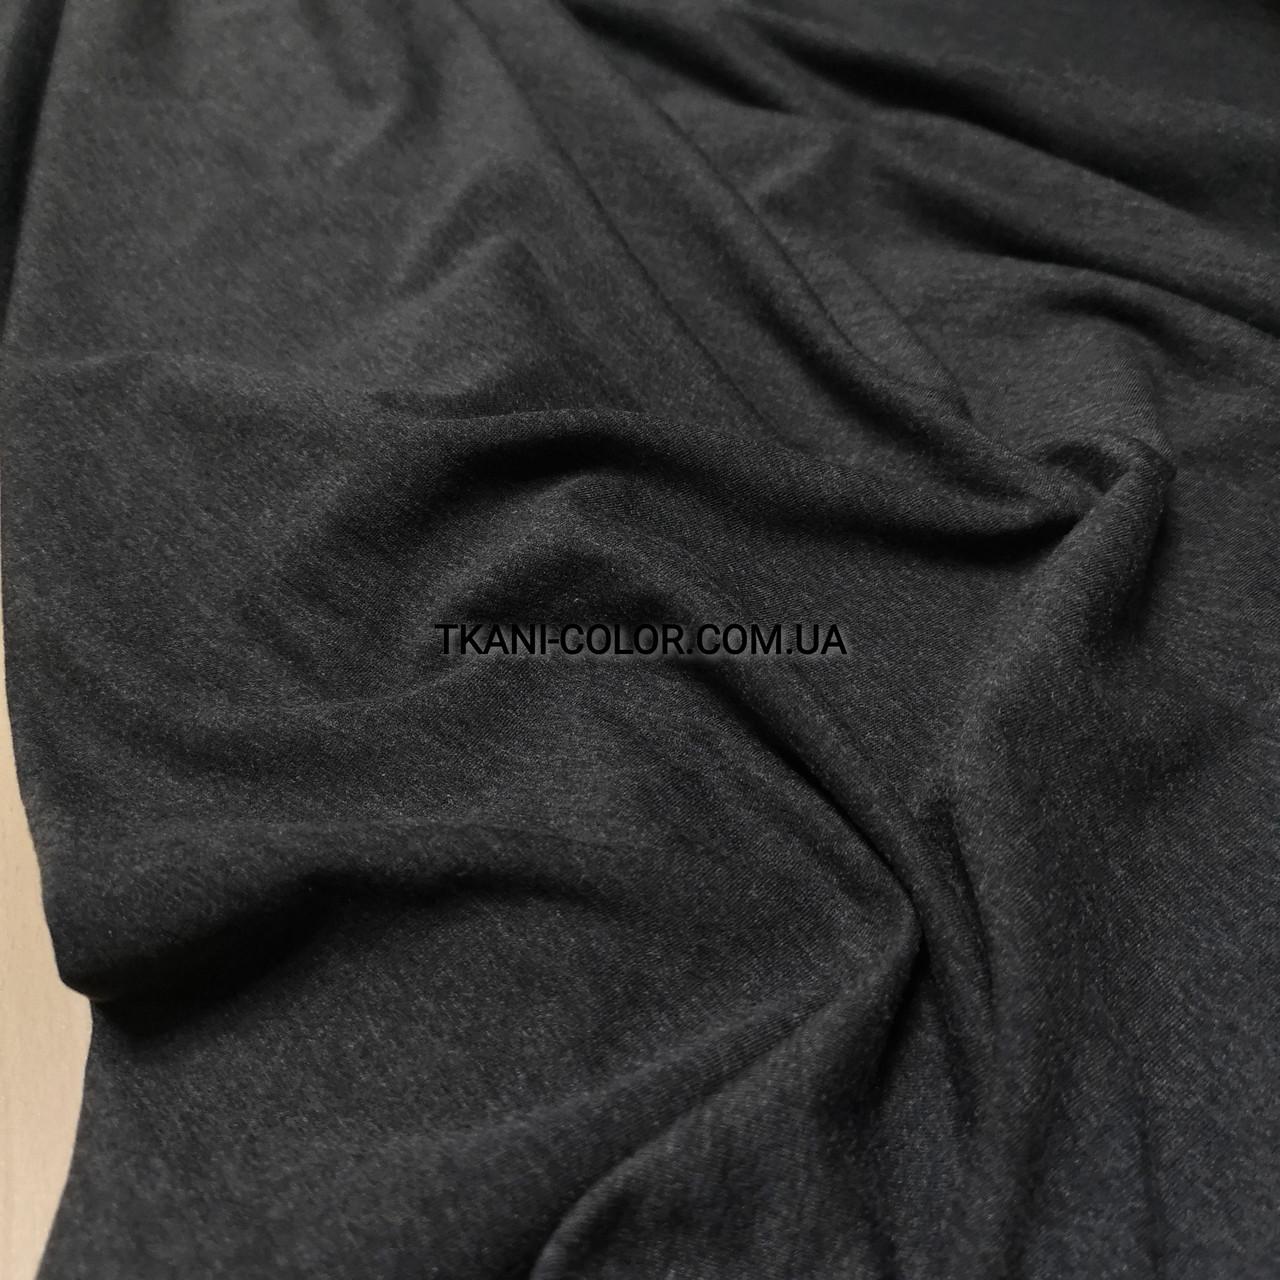 Футер двунитка темно-серый меланж (180 см)